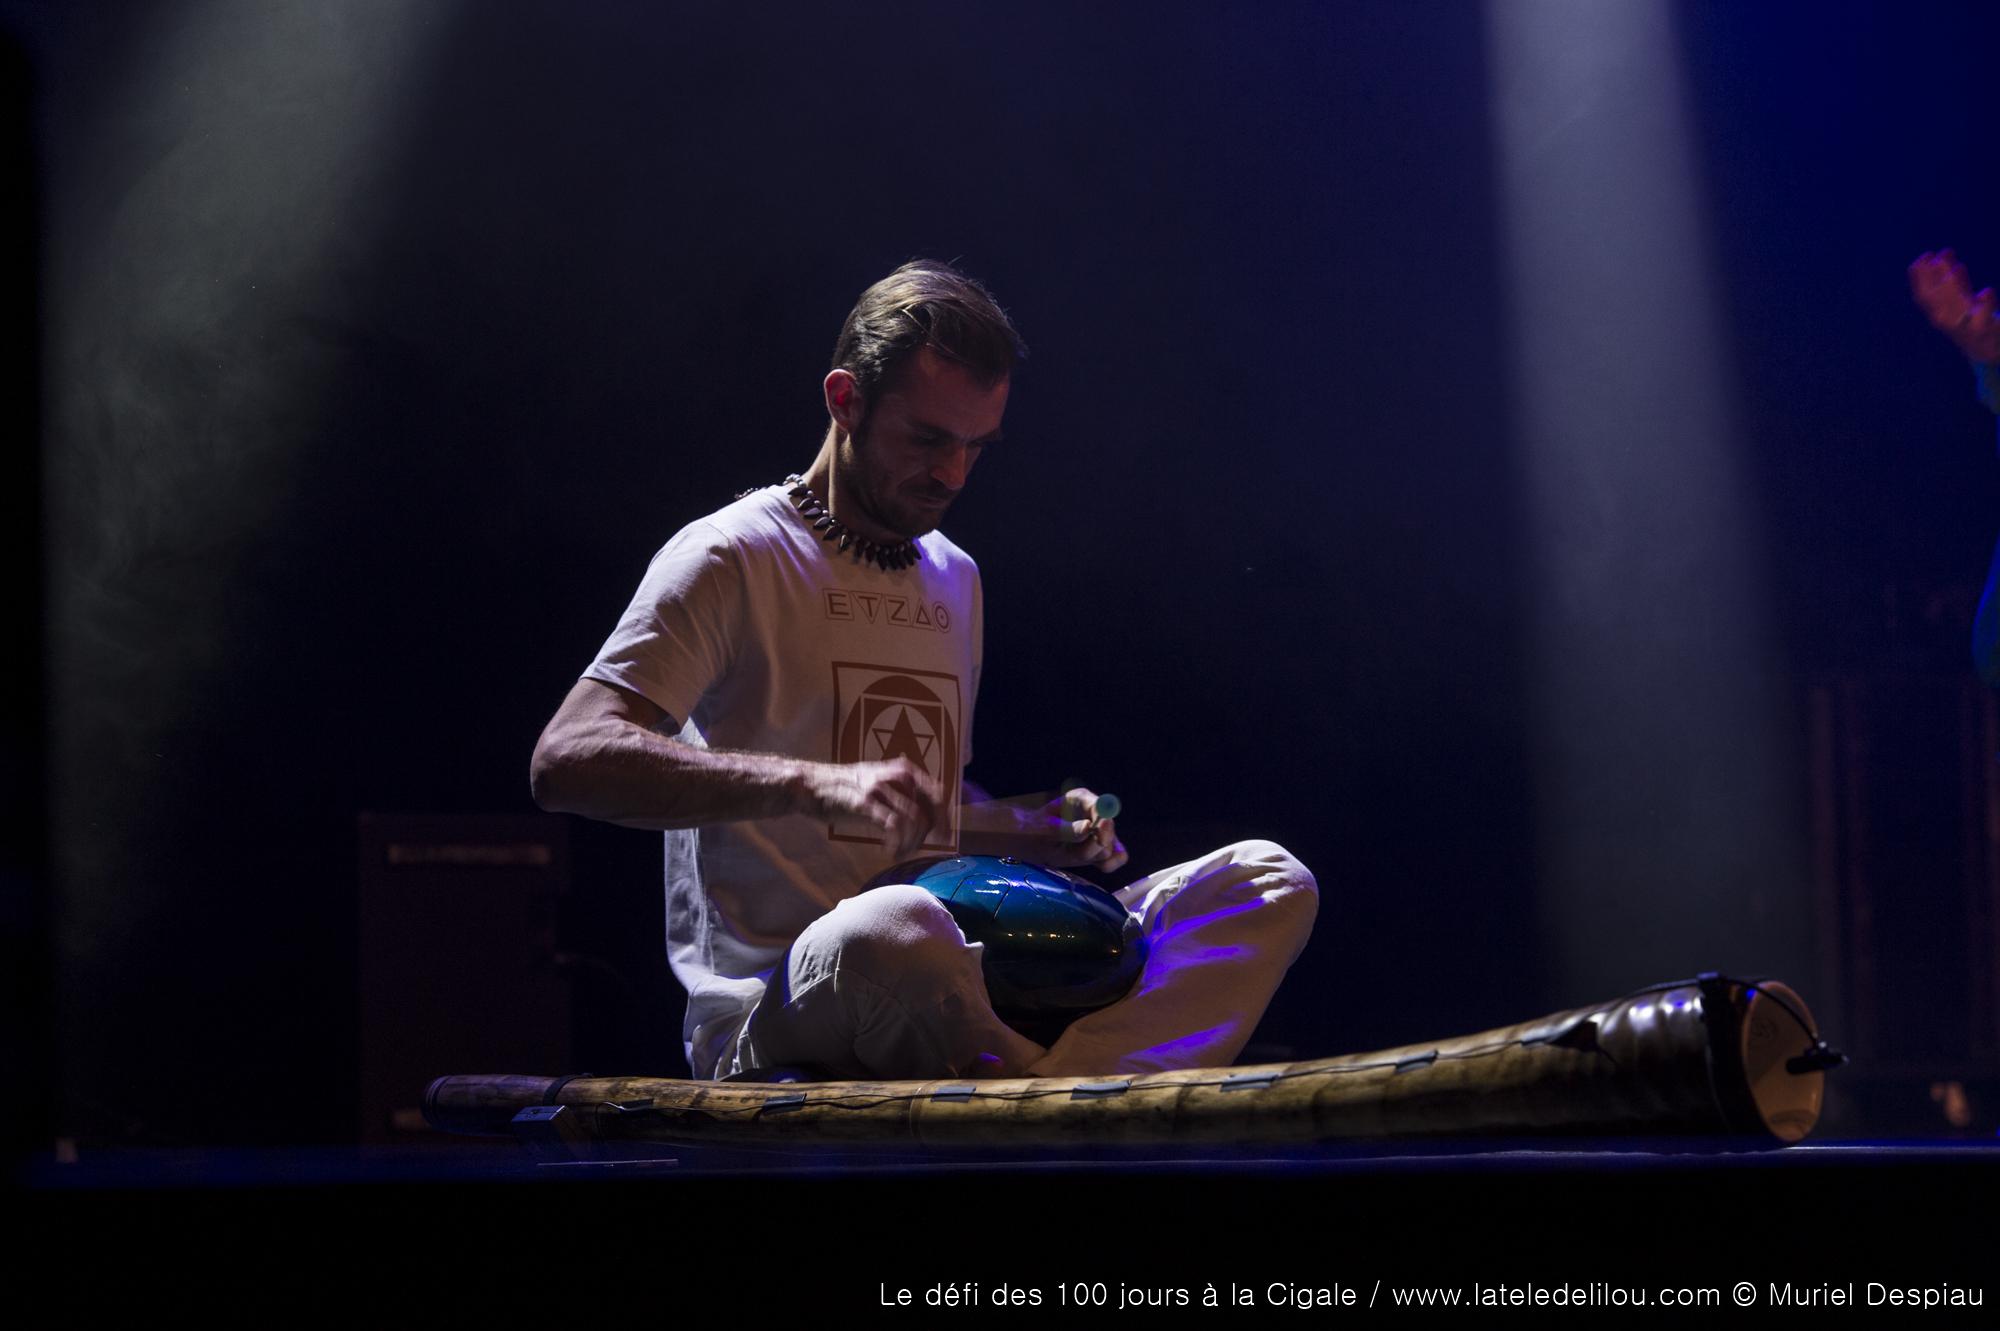 La Cigale (Replay 3/6) : ETZAO au Didgeridoo et B.E.A. One mum show & Ancrage WAKA - Paris - 22 avril 2018